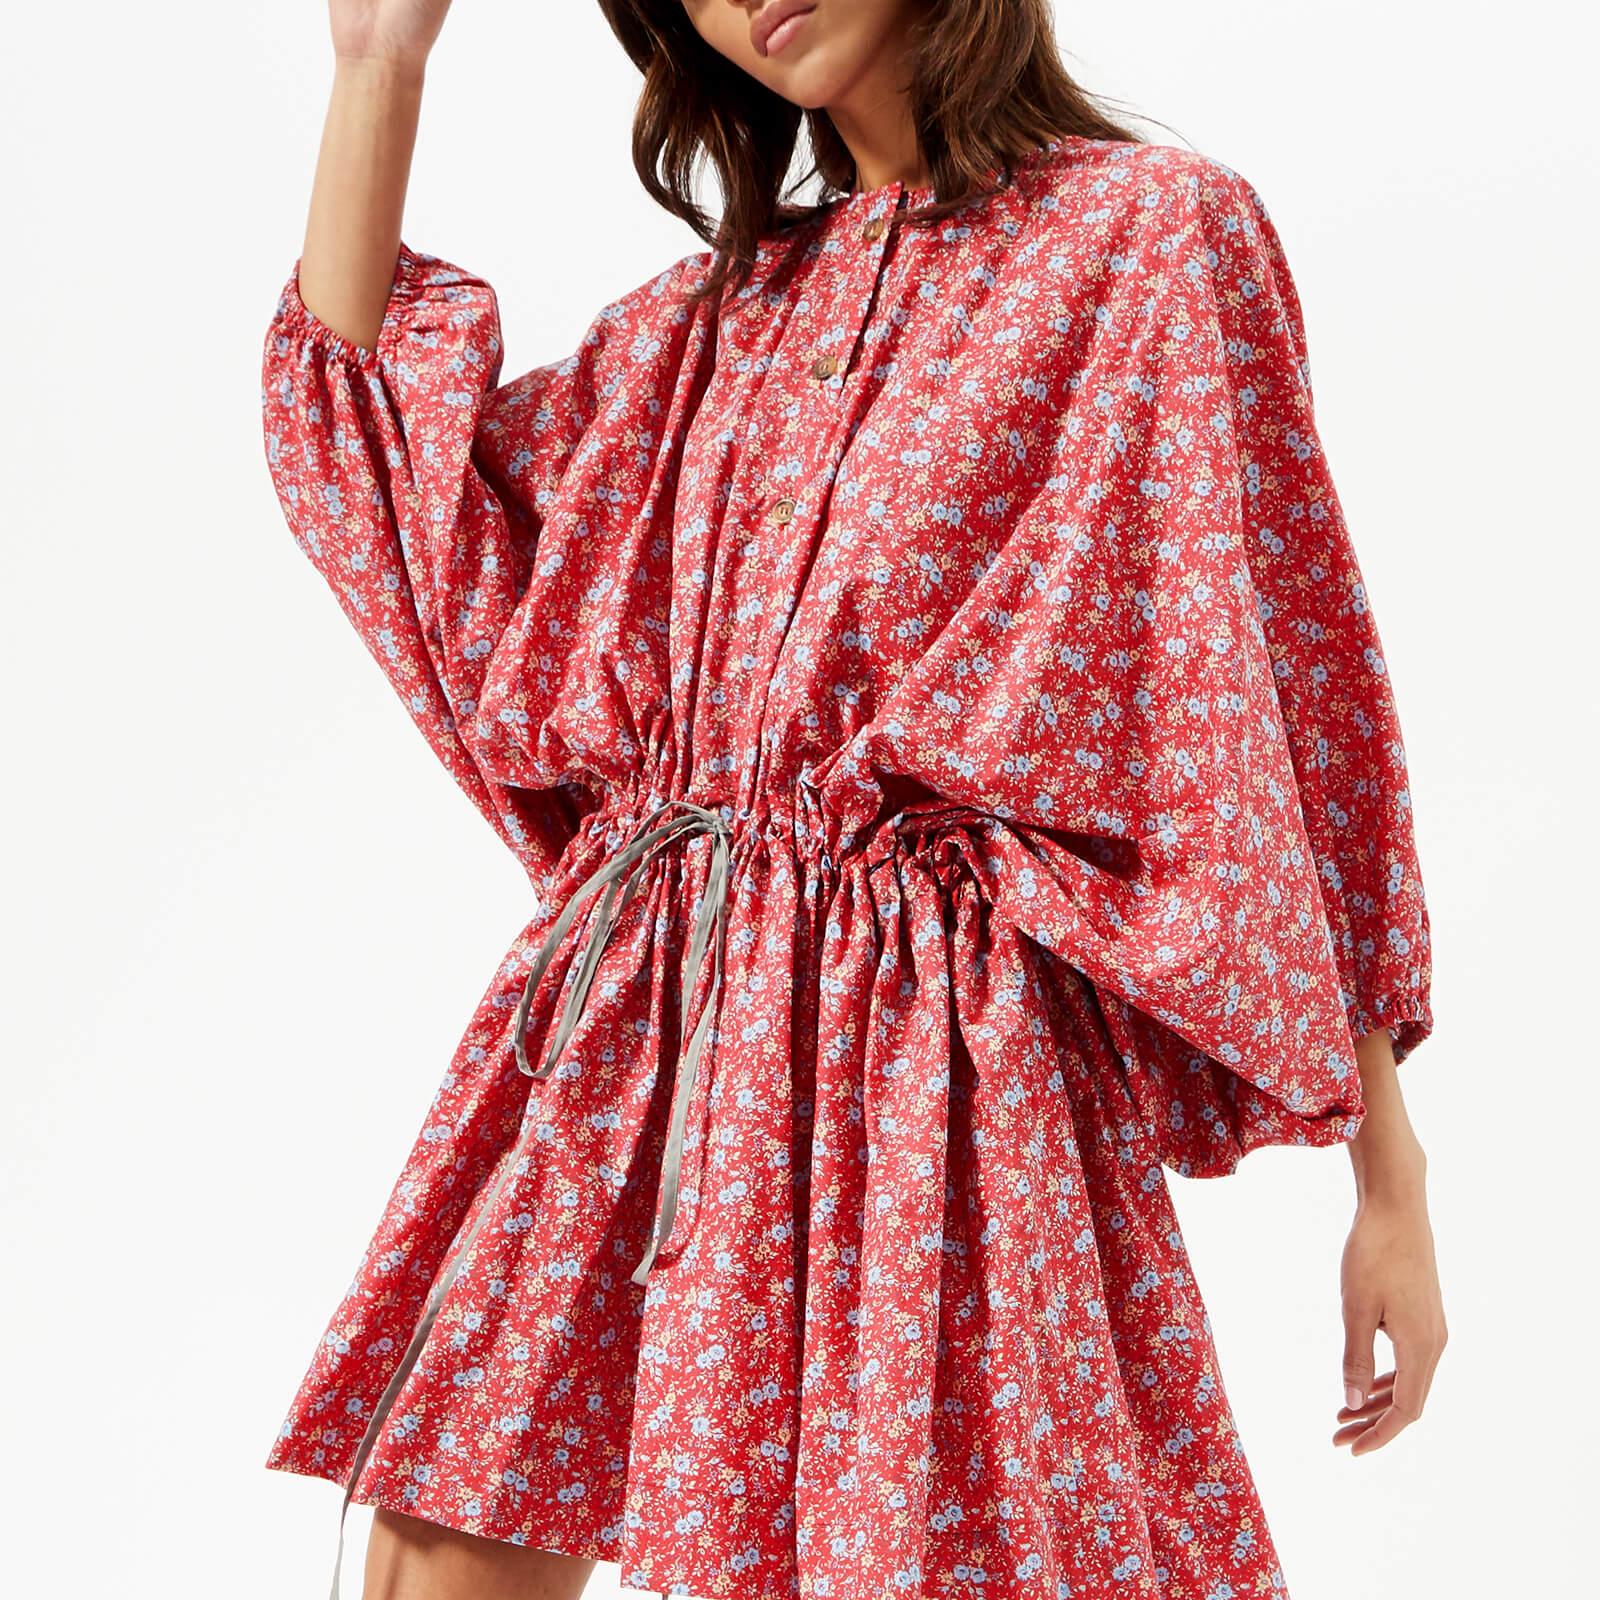 Vivienne Westwood Anglomania Women s Blast Dress - Red Flower Printed -  Free UK Delivery over £50 913af2100